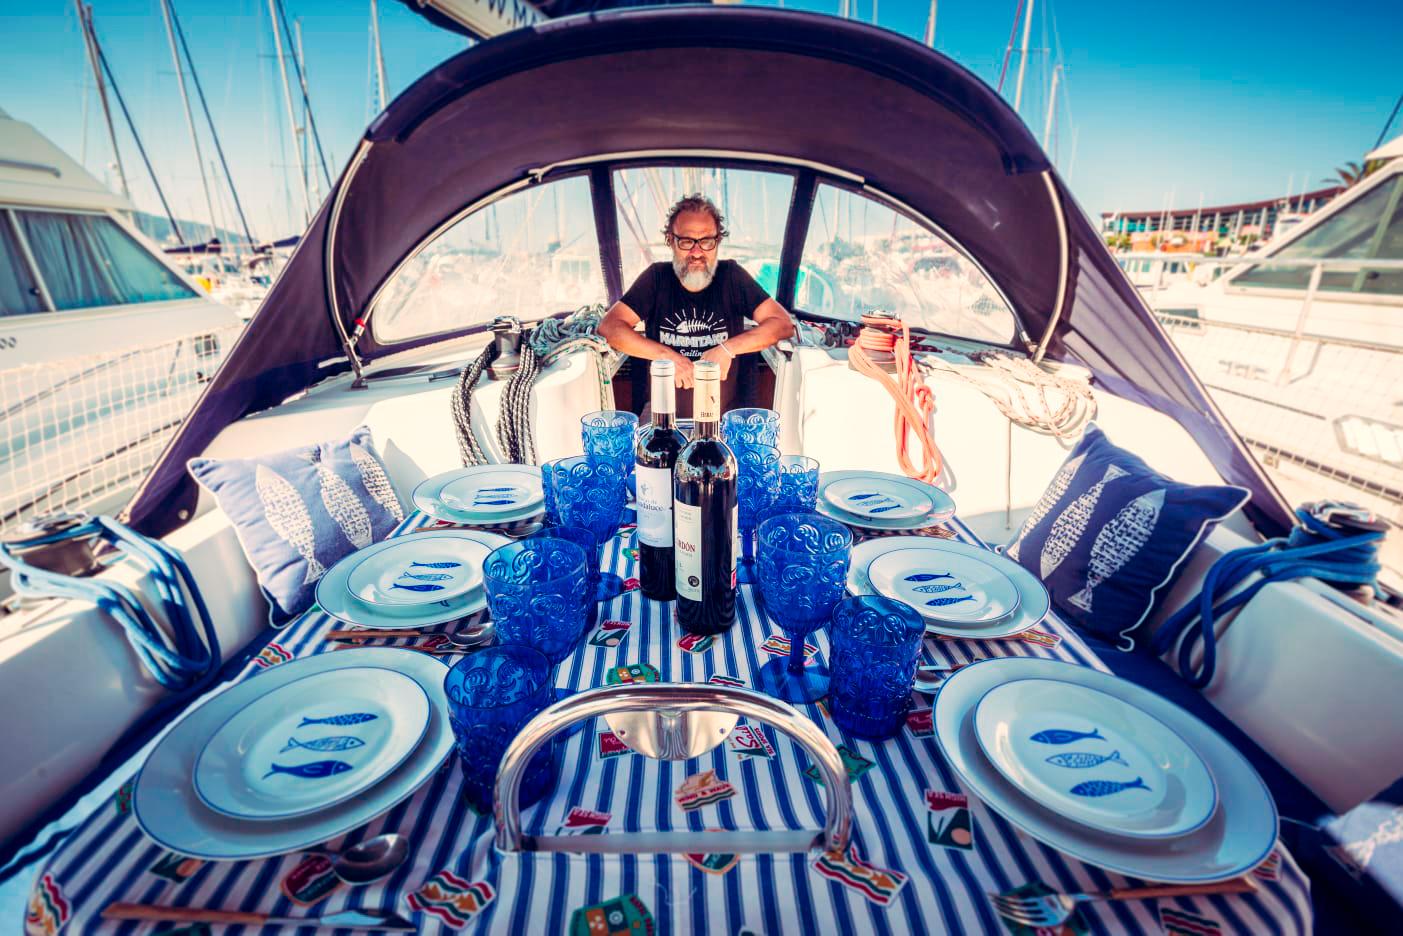 Marmitako Sailing - Edorta, el capitán